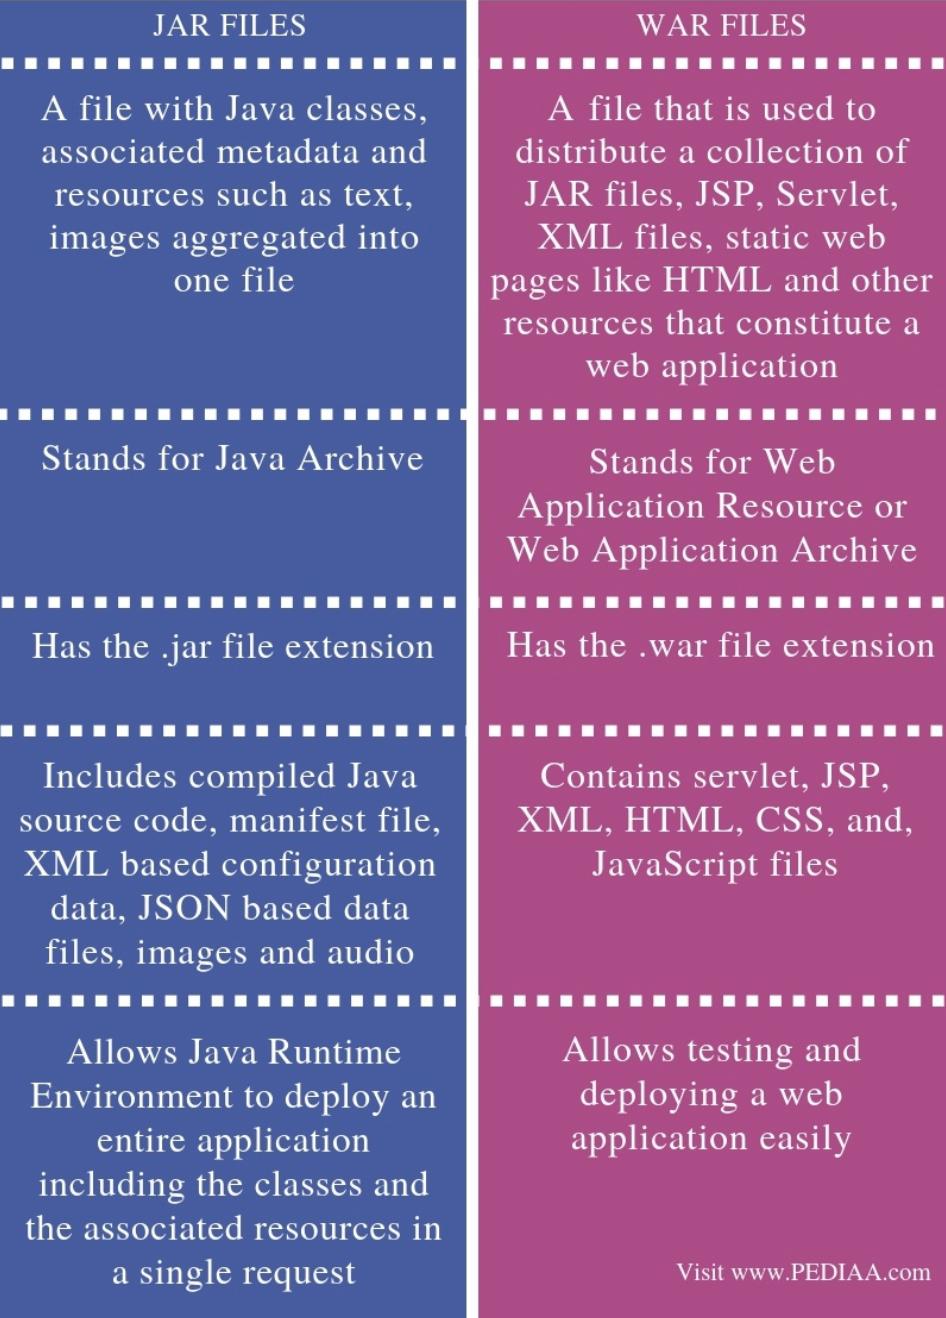 JAR和WAR文件之间有什么区别?